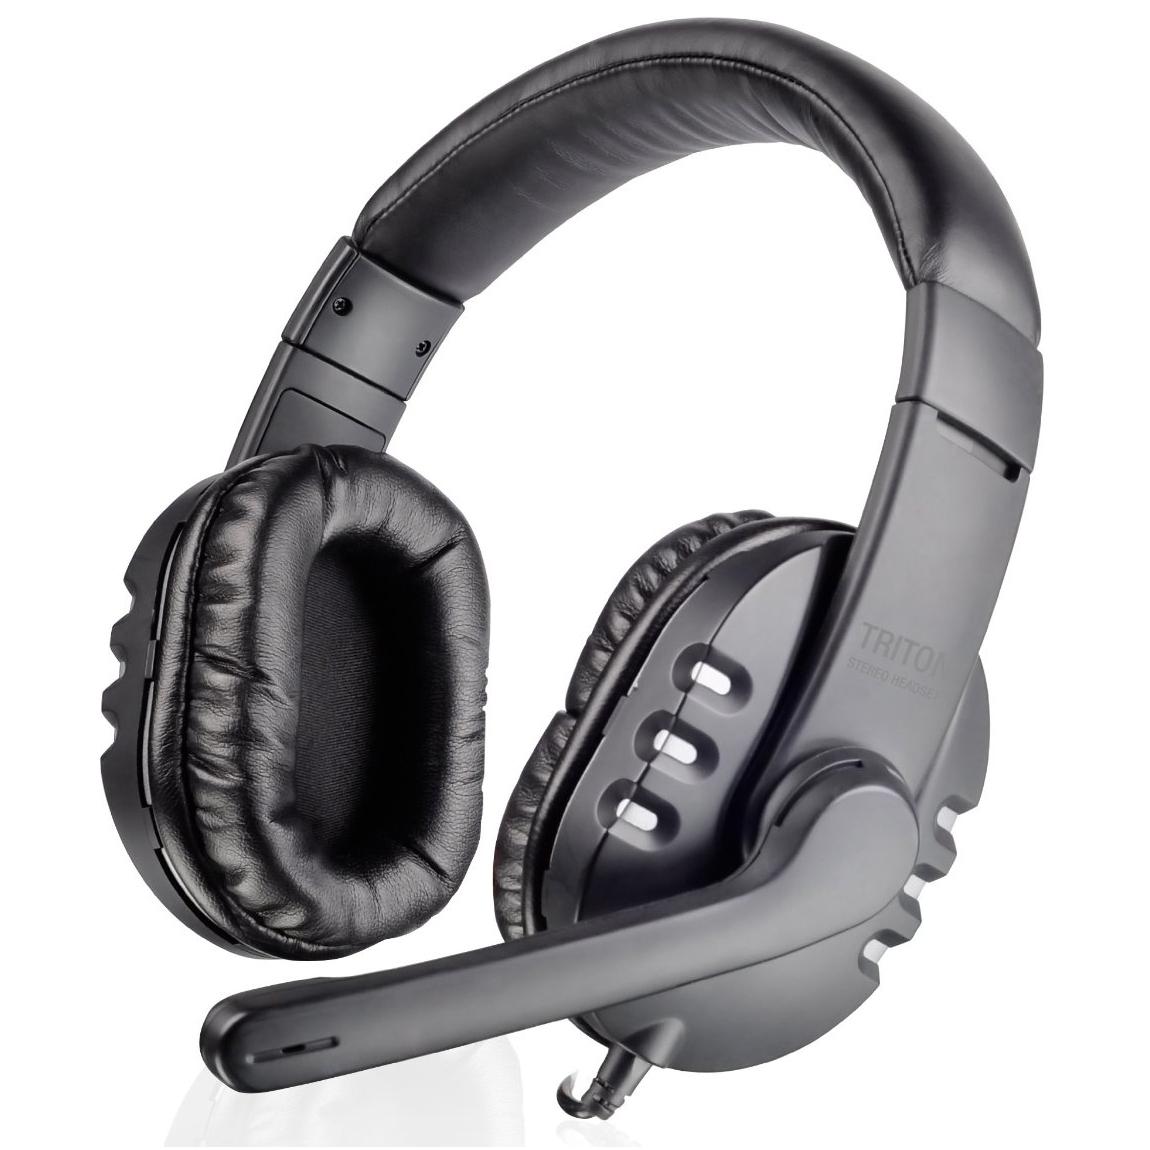 Sennheiser earphones with microphone - earphones with mic bluetooth